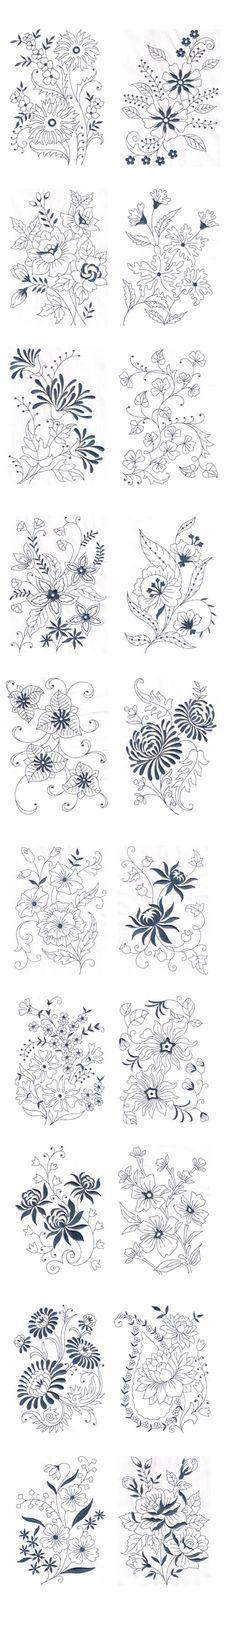 Vintage Floral Design - Machine Embroidery Design on Behance: